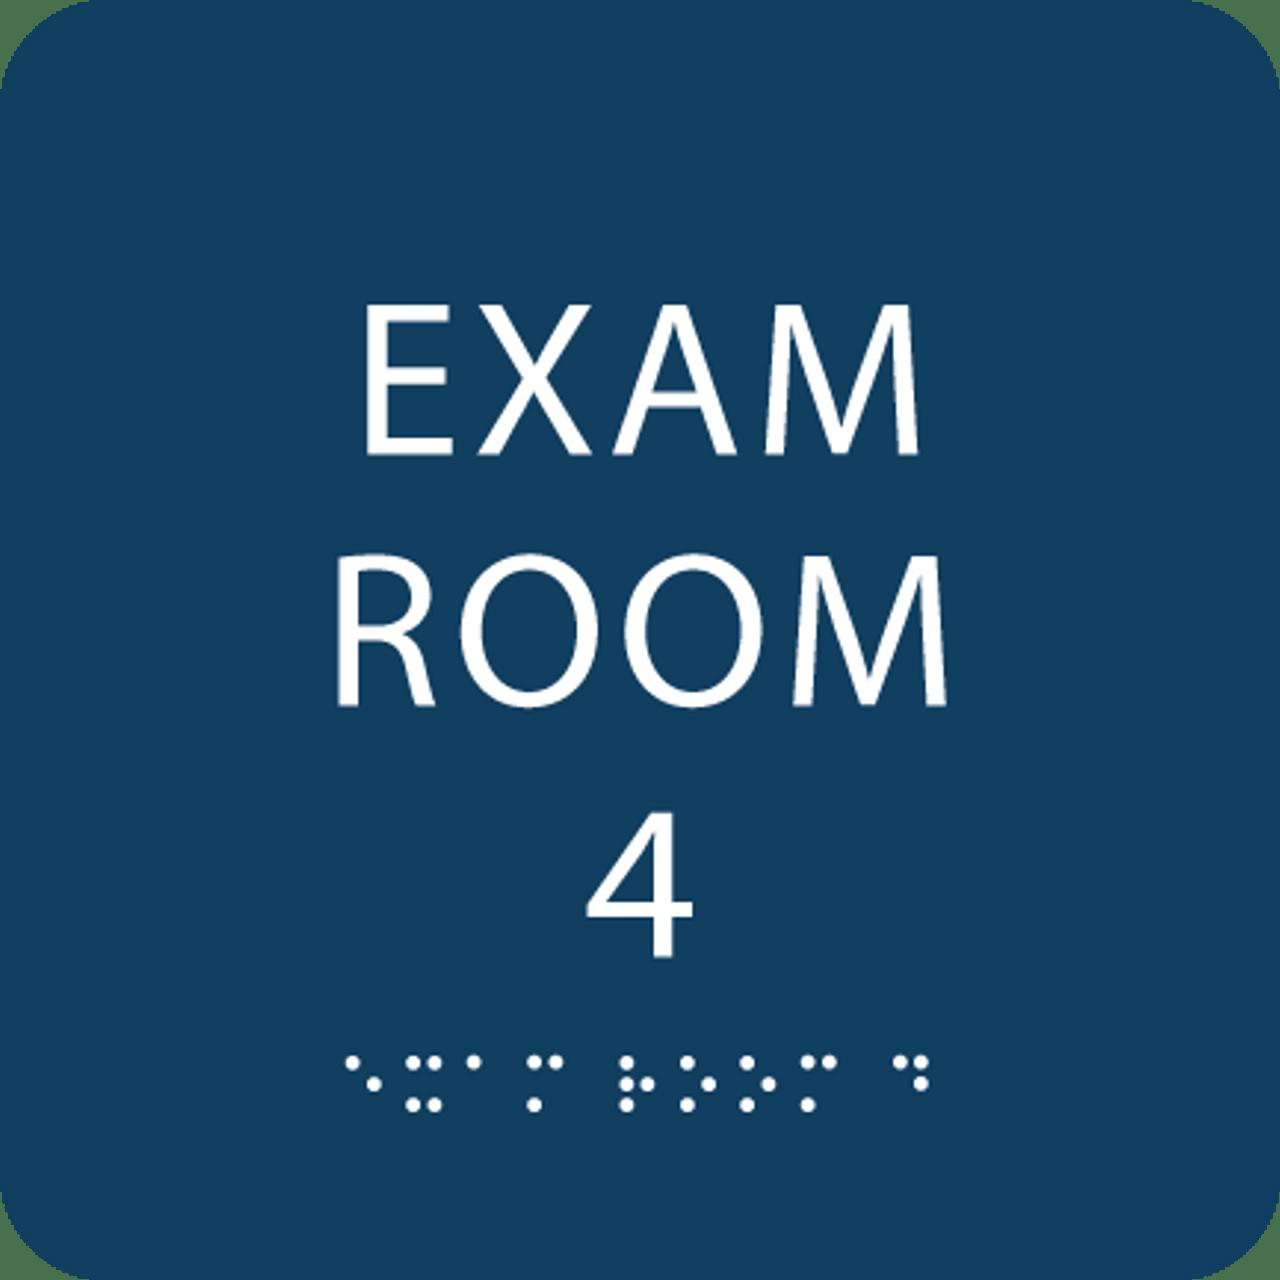 Dark Blue Exam Room 4 ADA Sign